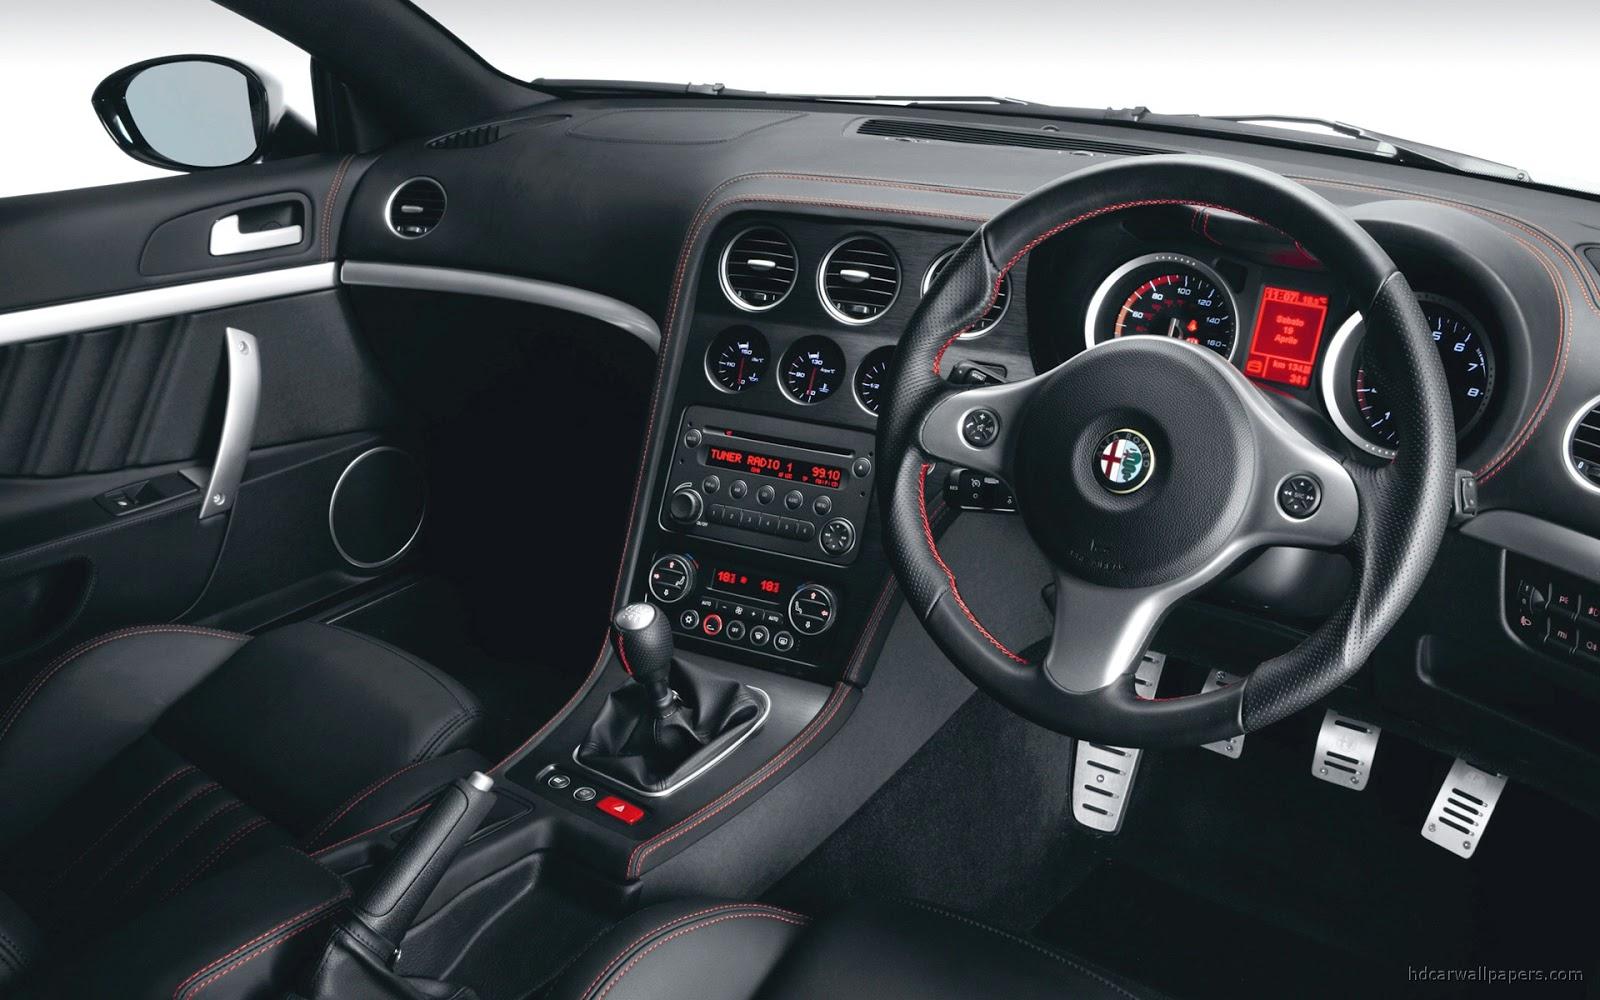 Alfa Romeo Brera S Interior